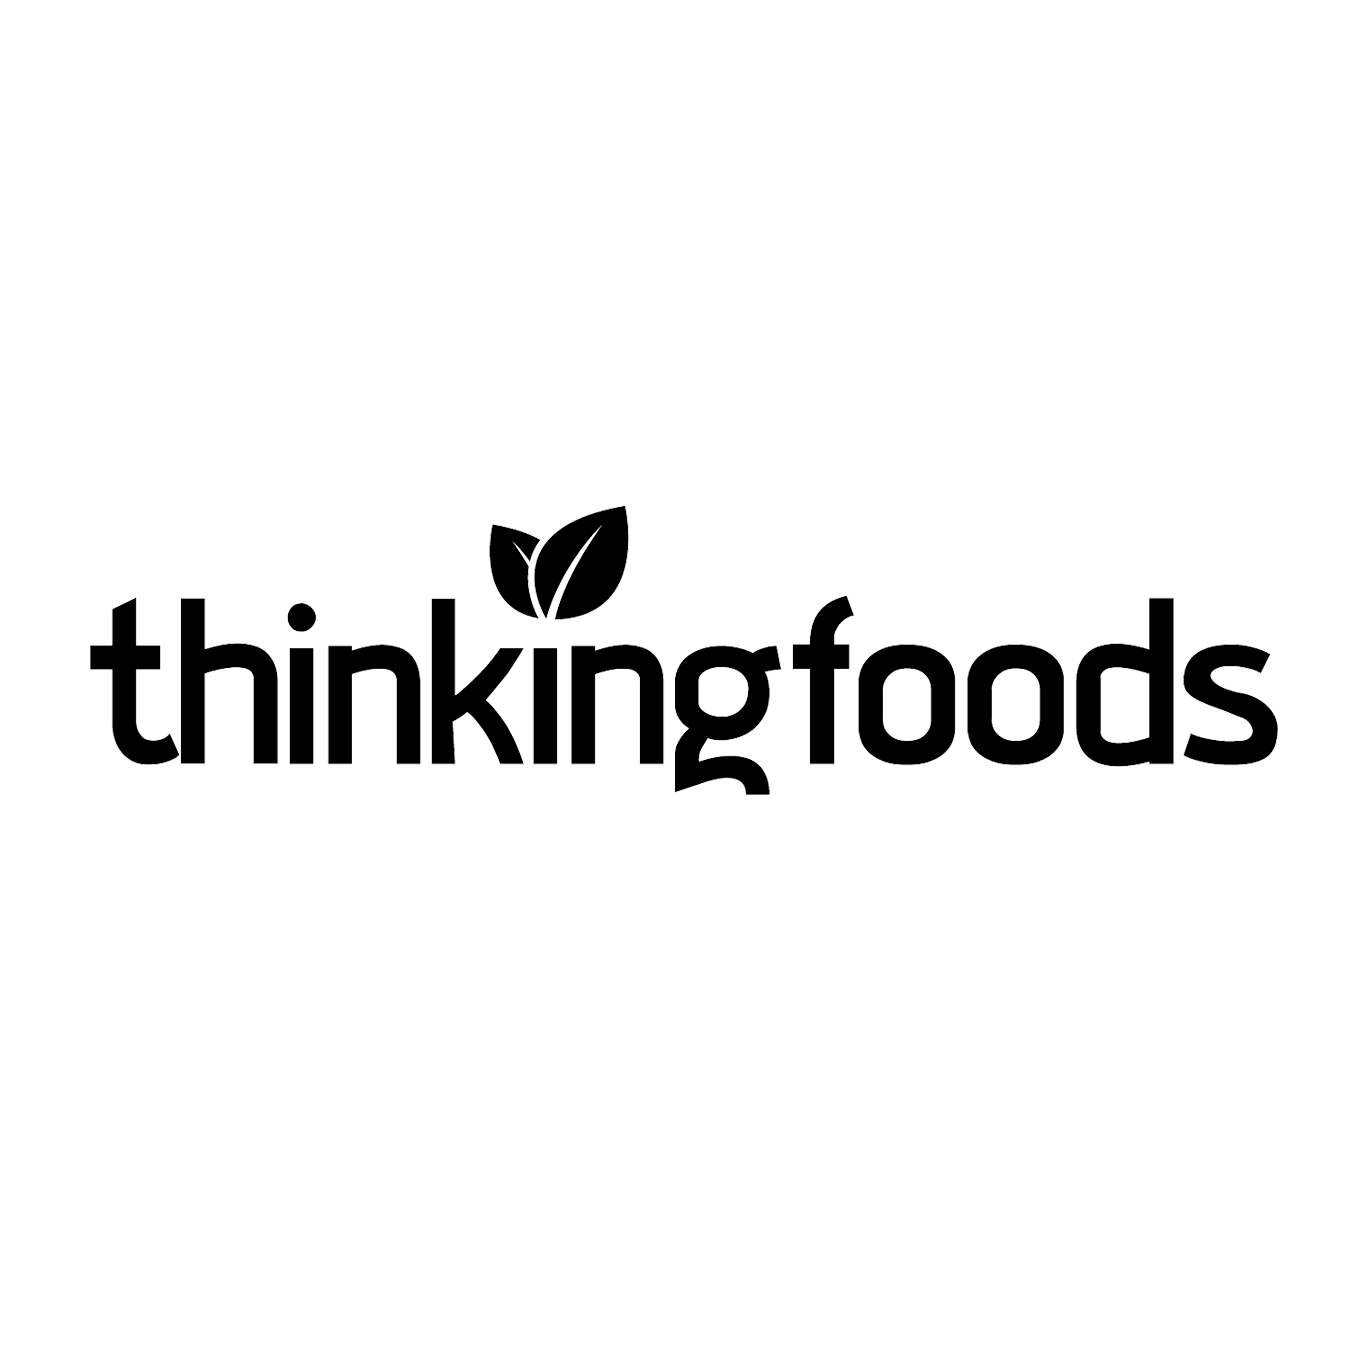 Thinking Foods